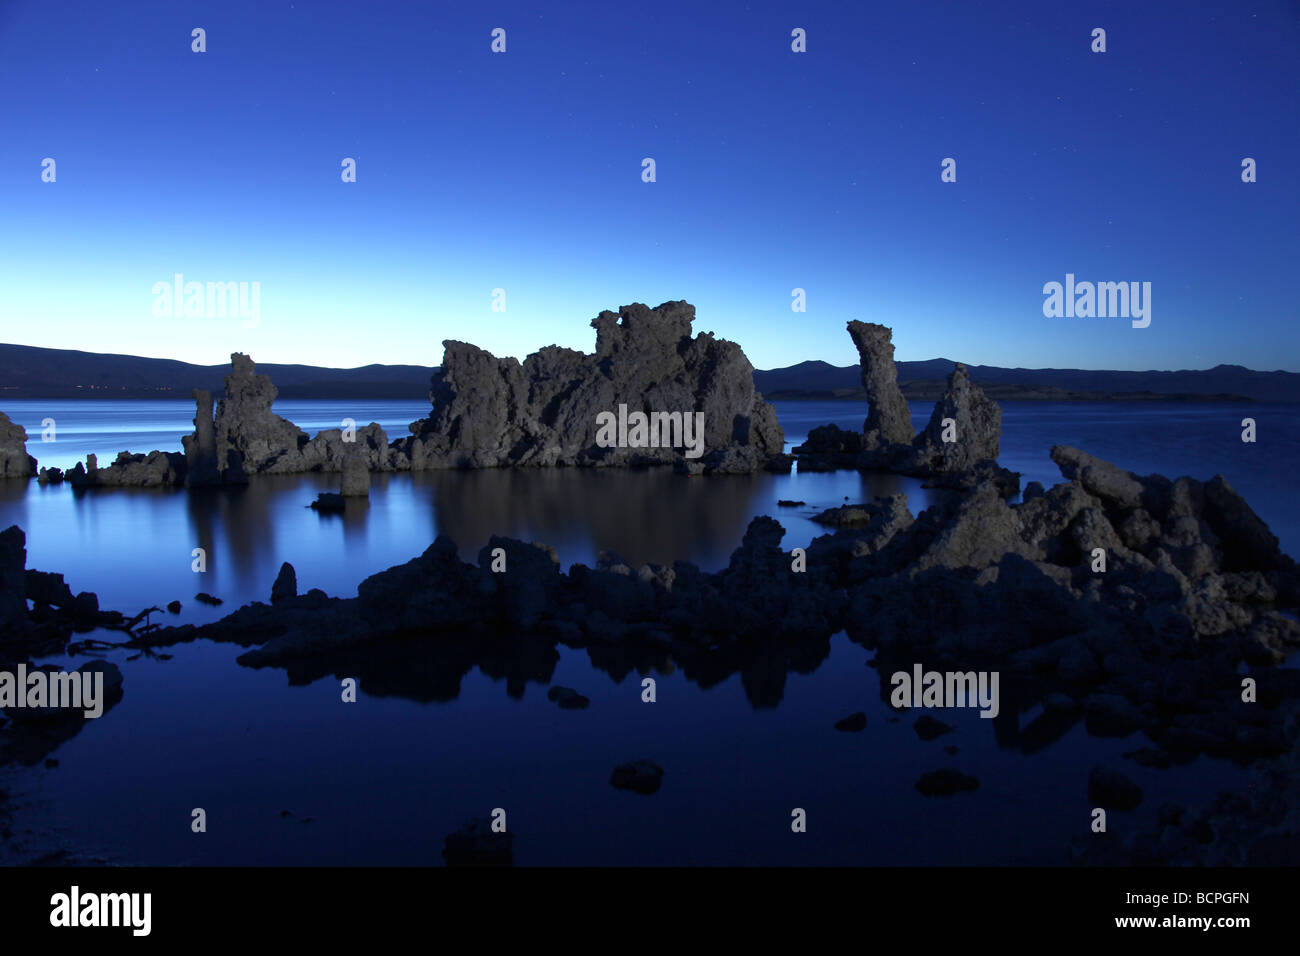 Surreal Tufa Rock Formations in Mono Lake Califonia - Stock Image